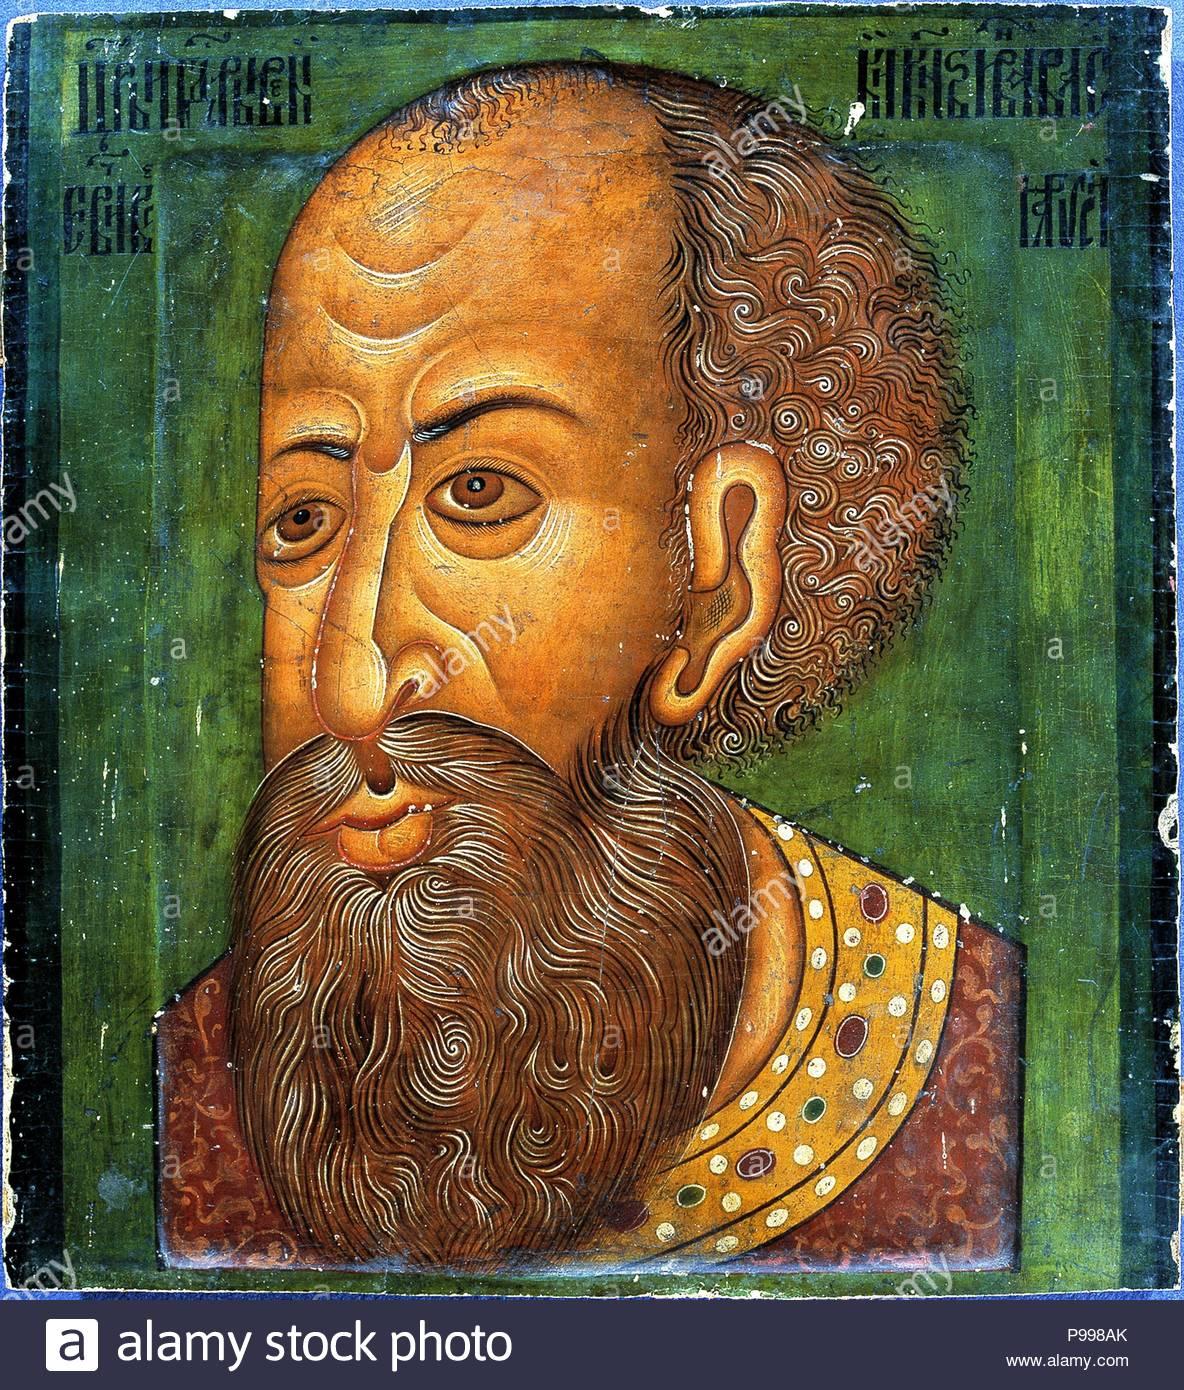 Ivan IV the Terrible. Museum: Nationalmuseet, Copenhagen. - Stock Image